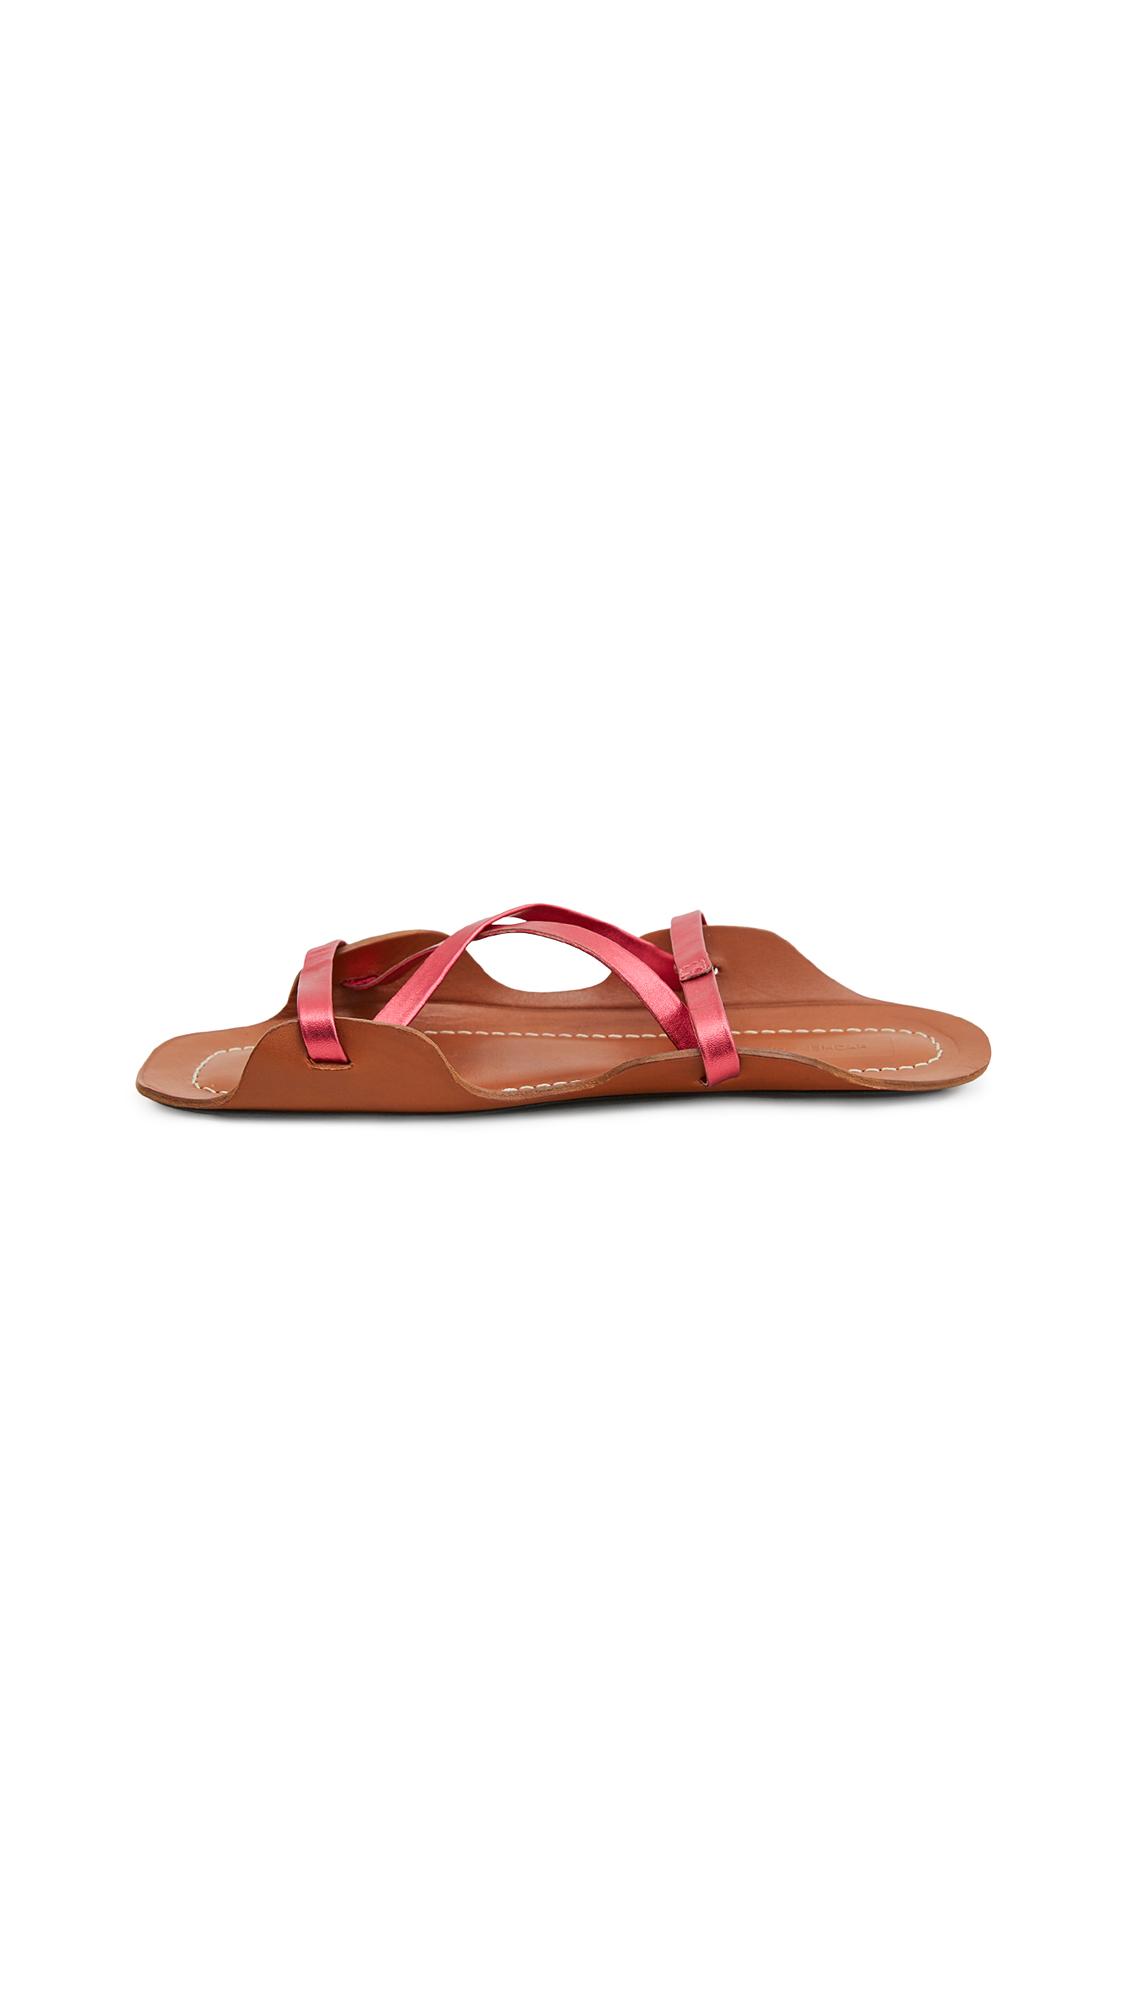 Rachel Comey Pax Sandals